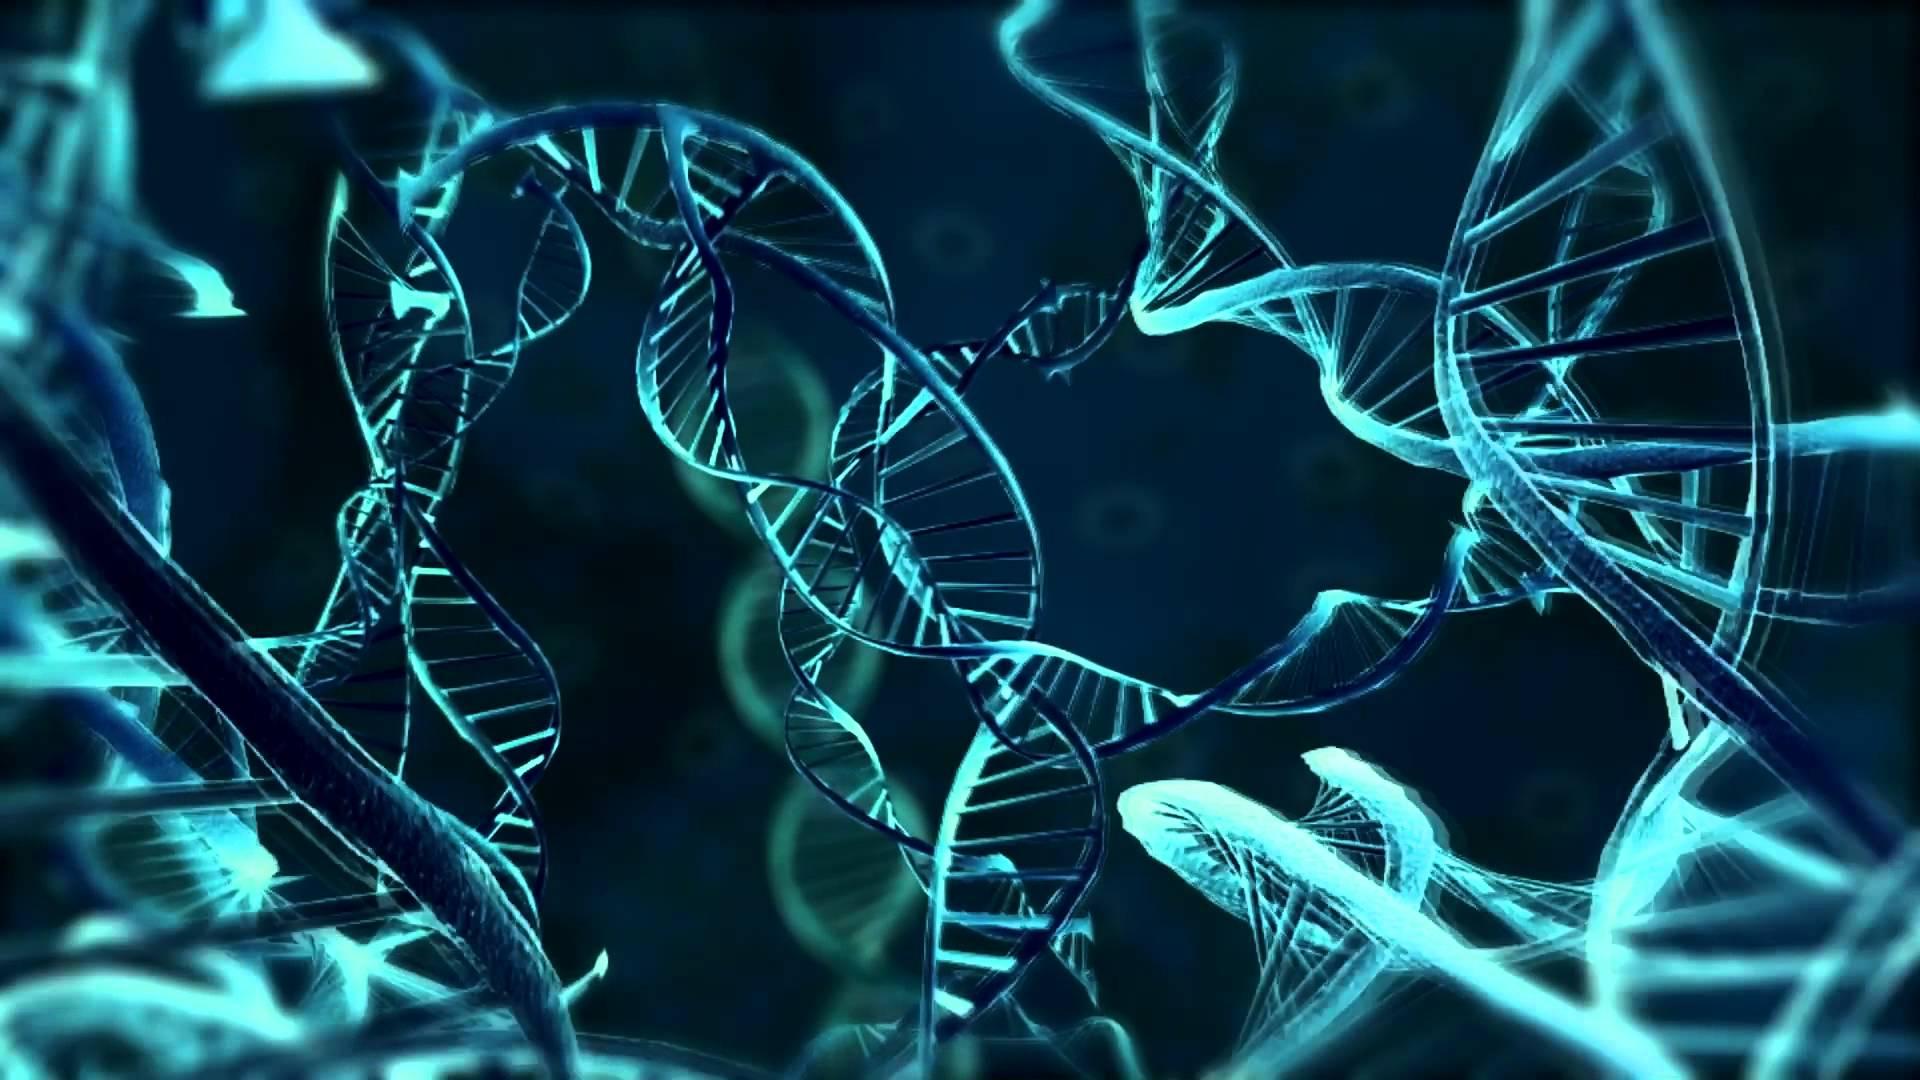 Biochemistry Wallpapers High Resolution: Biochemistry Wallpapers